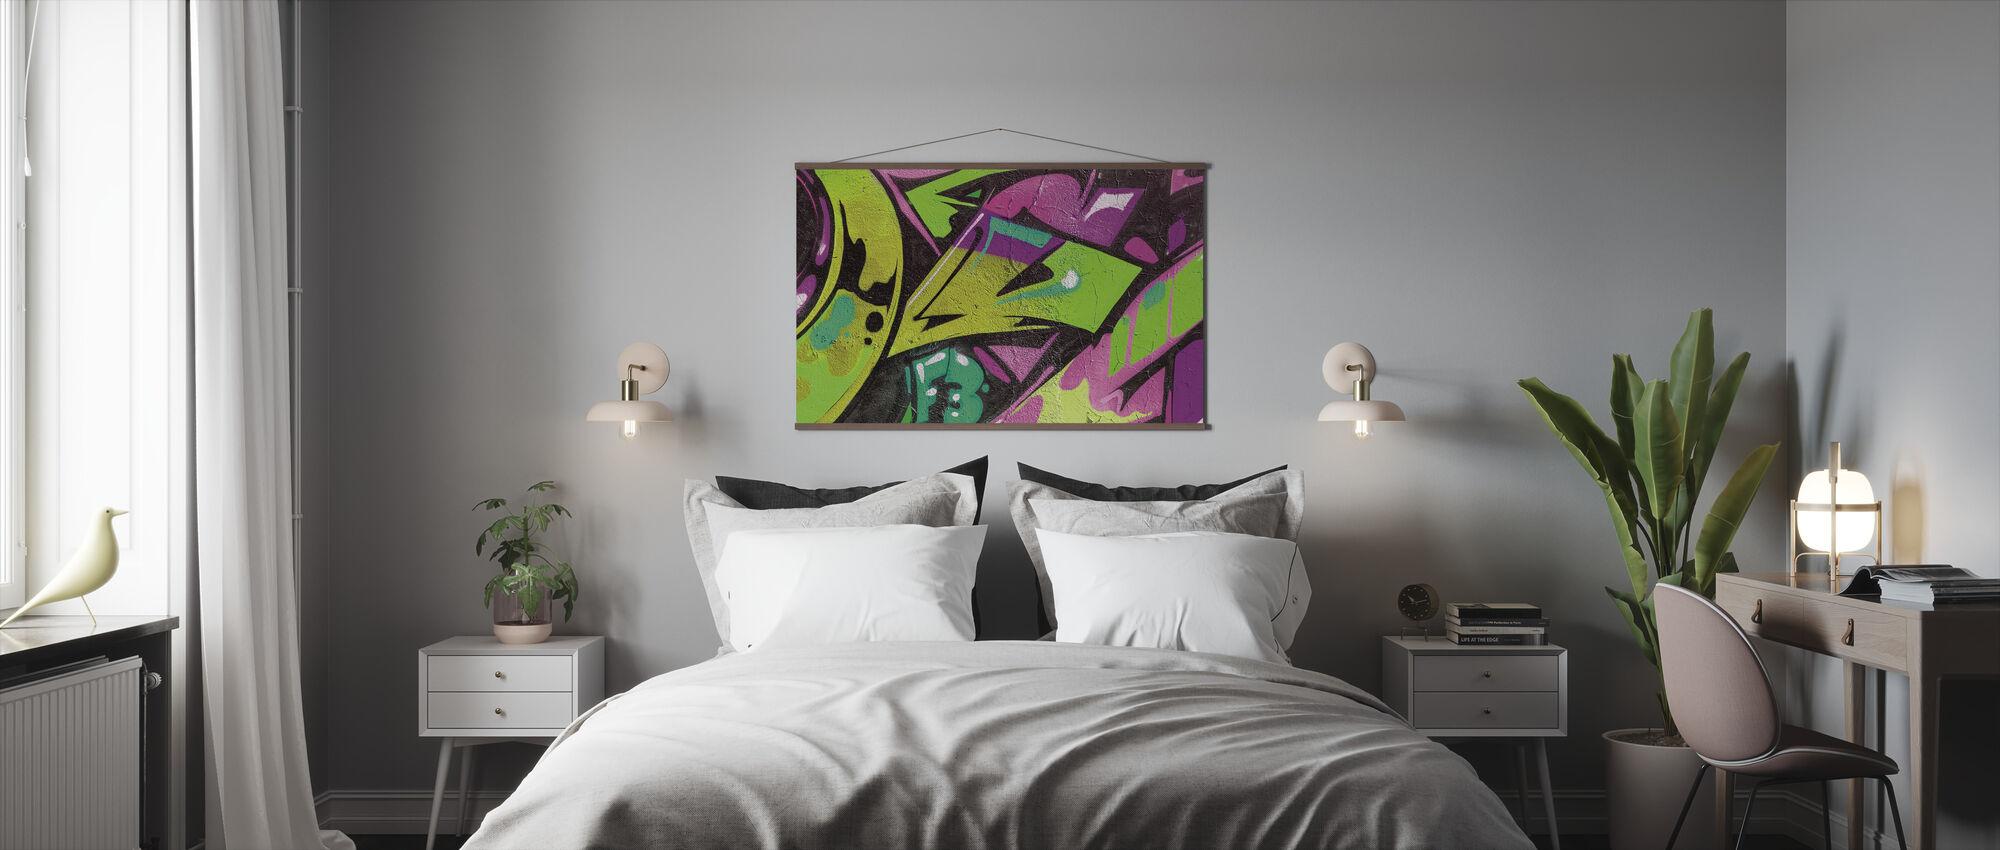 Urban Graffiti Detail - Poster - Bedroom